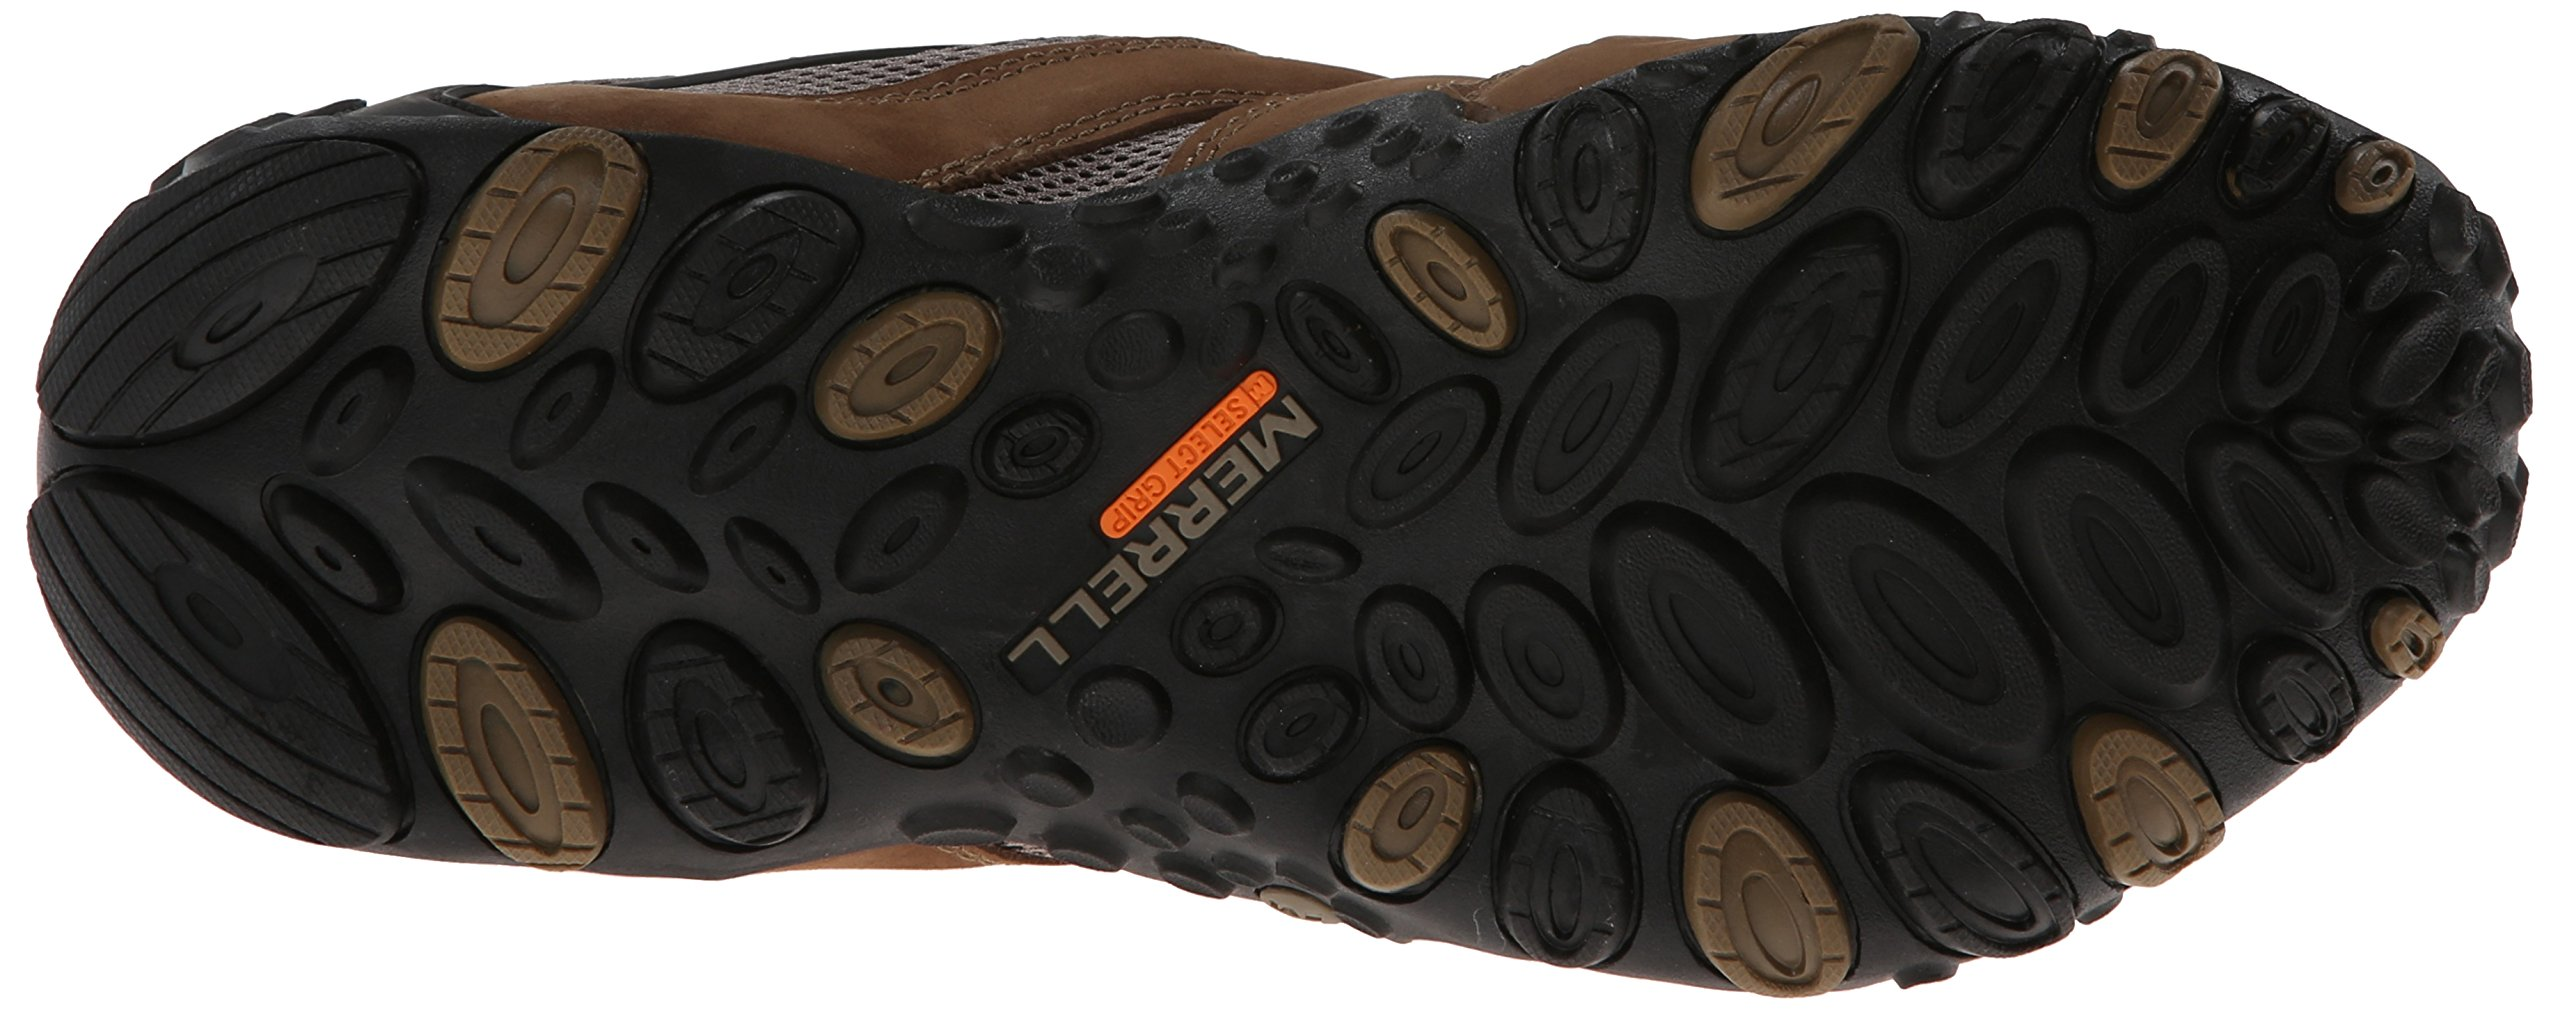 1217b22cfa Merrell Men s Chameleon Prime Stretch Hiking Shoe